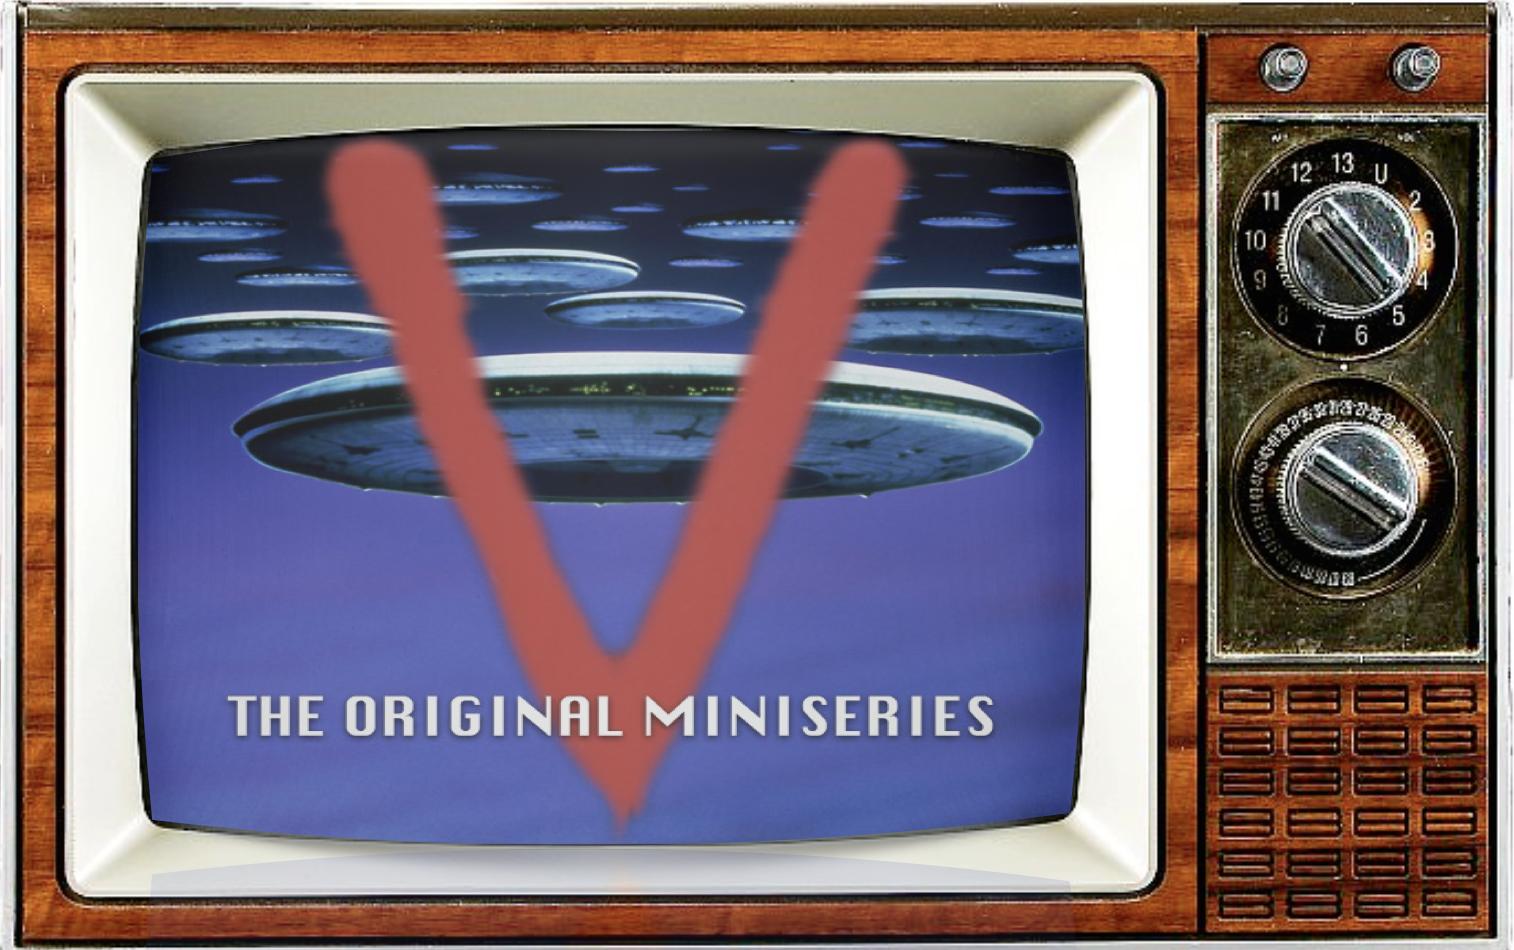 SMC Episode 83: Event TV is Back! V: The Original Miniseries w/ Kenneth Johnson & Marc Singer